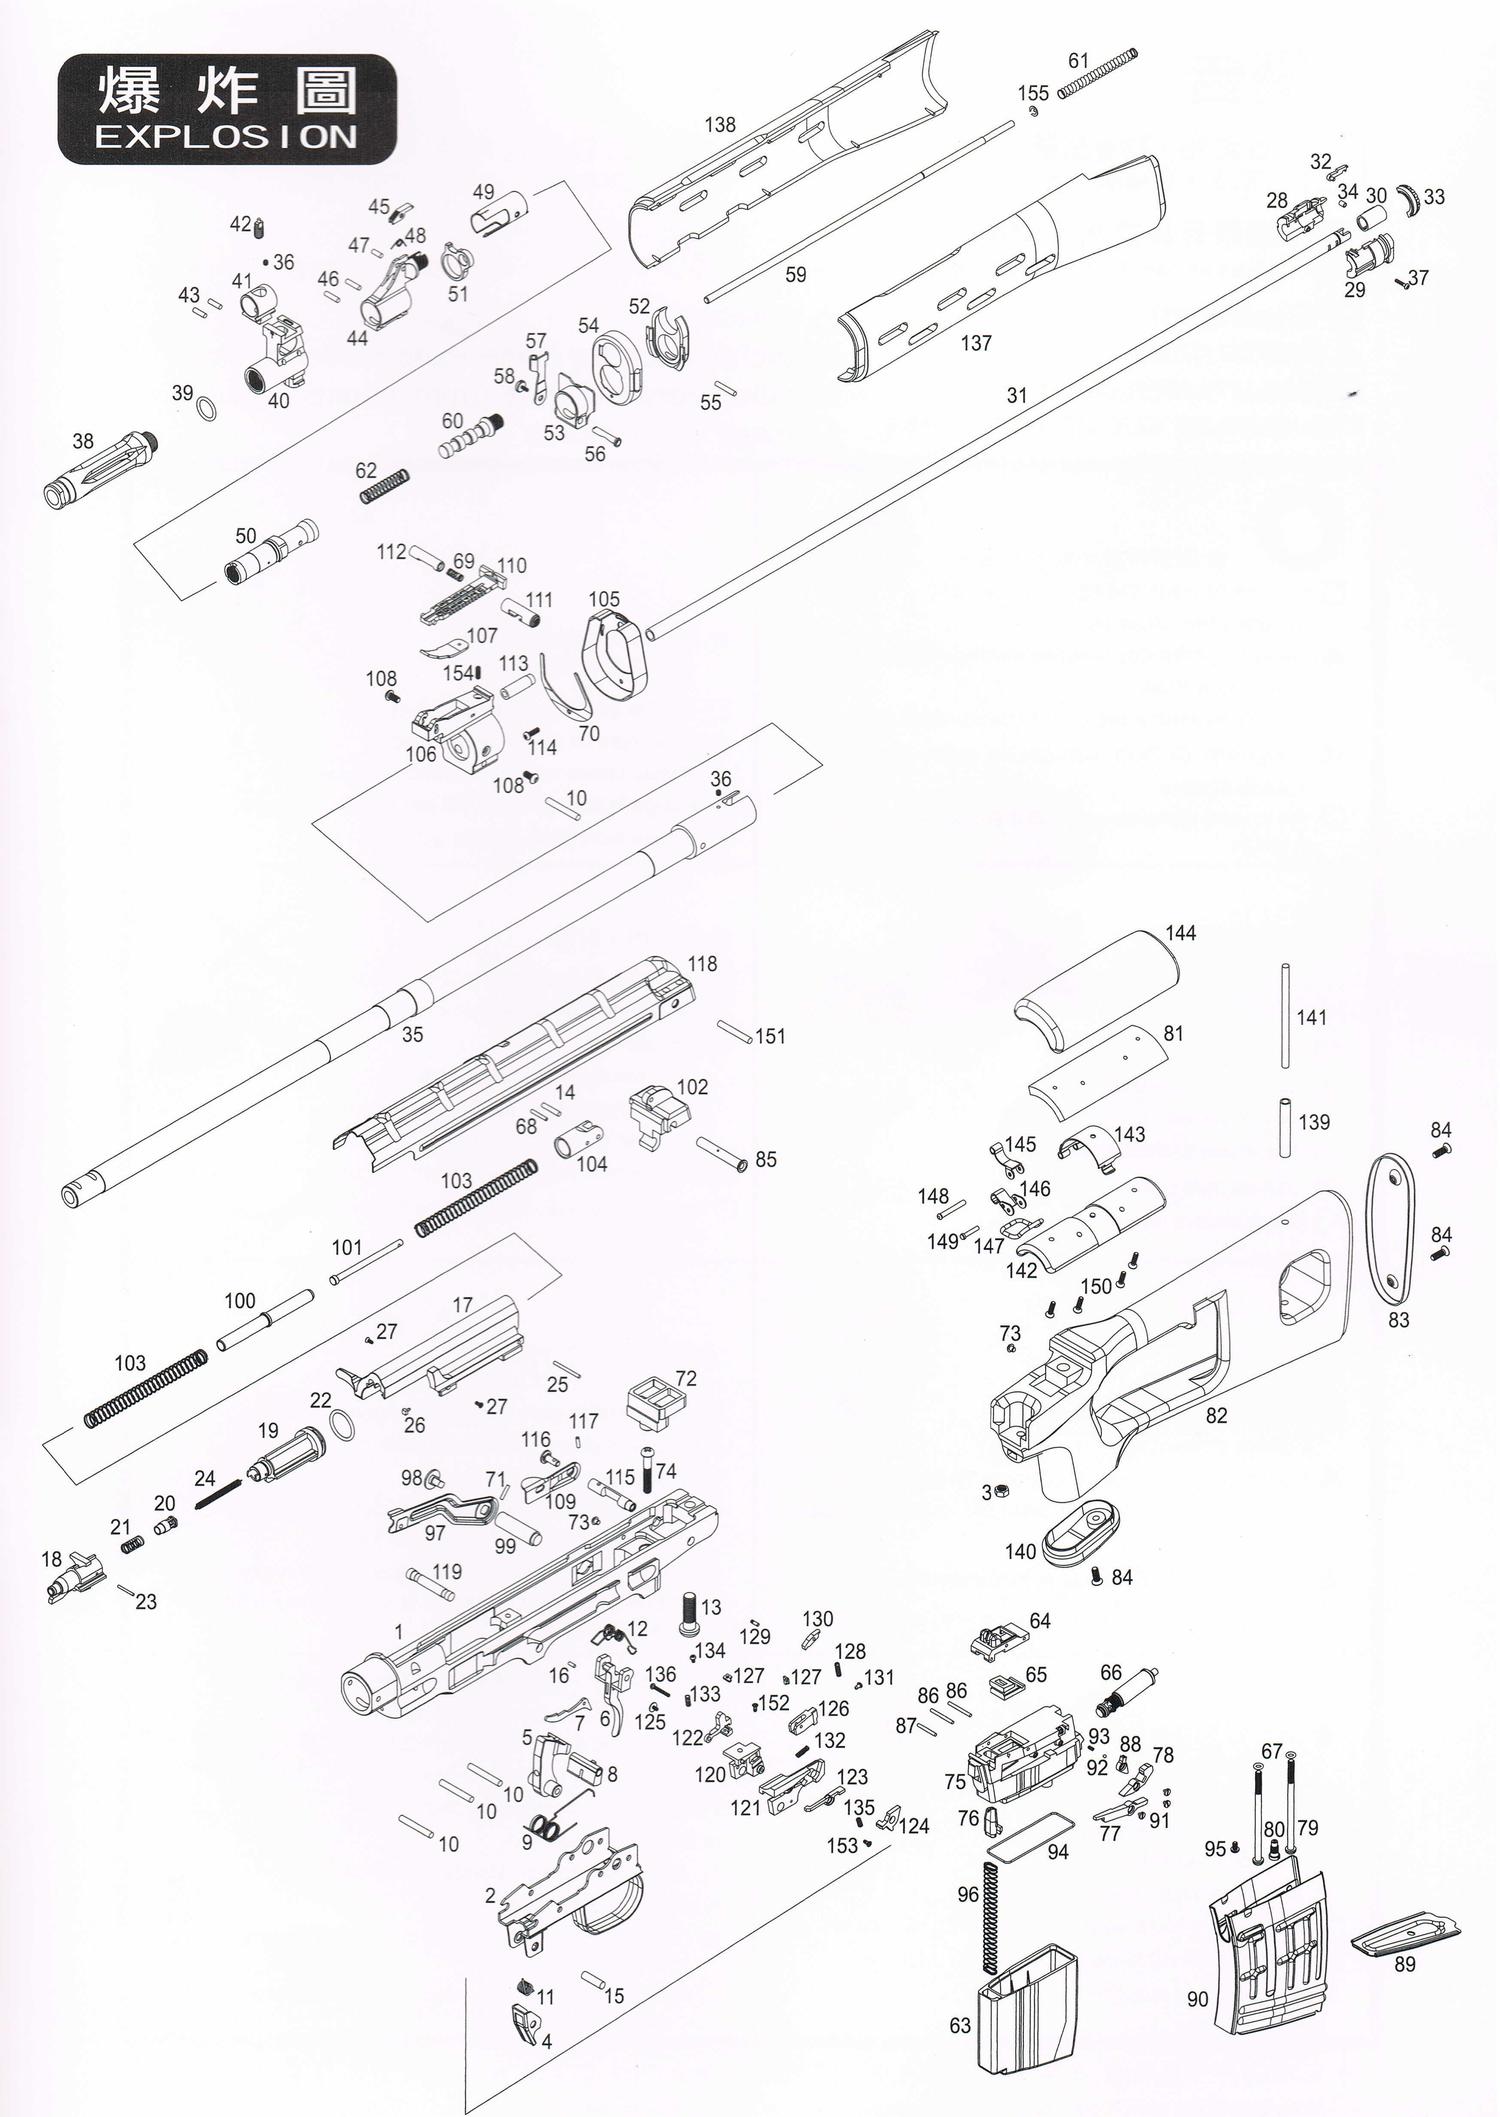 WE SVD(AceVD) ストライカースプリング No.128